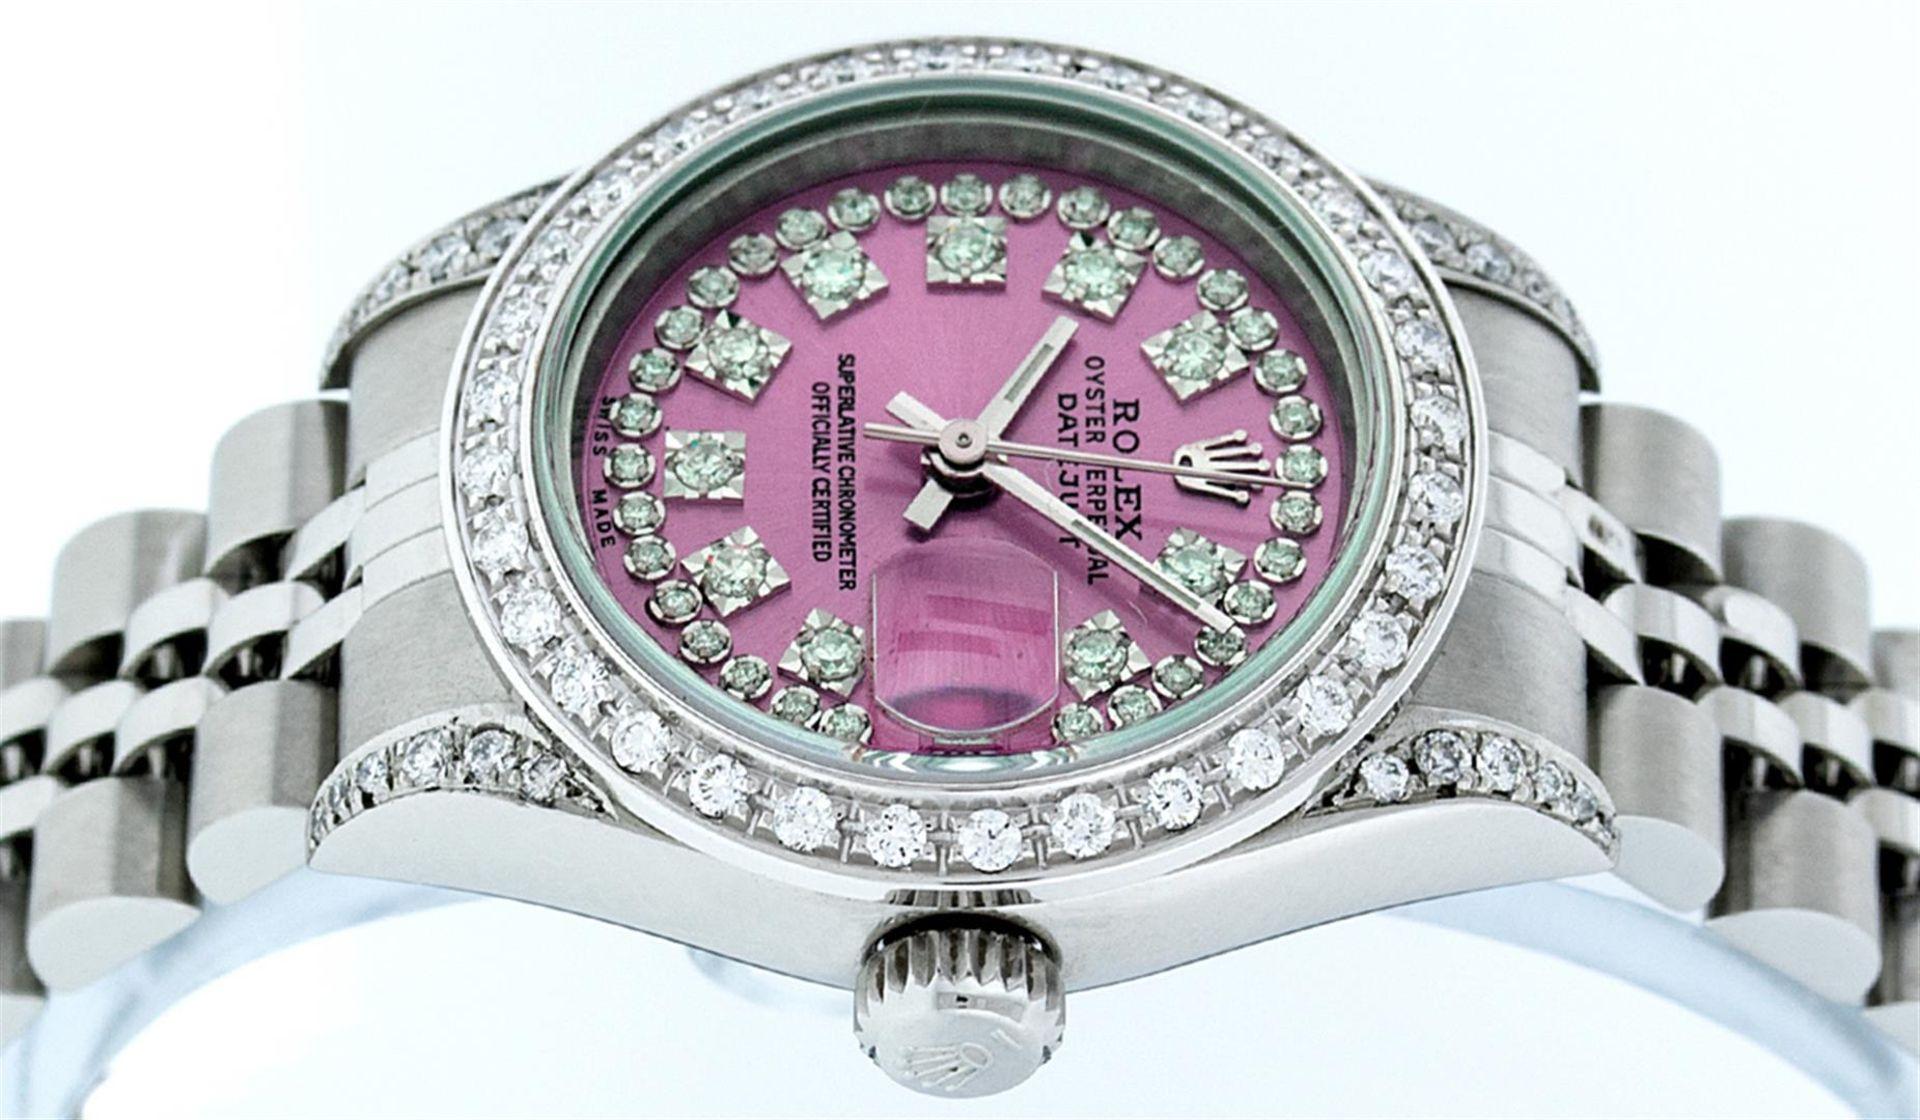 Rolex Ladies Stainless Steel Quickset Pink String Diamond Lugs Datejust Wristwat - Image 4 of 9